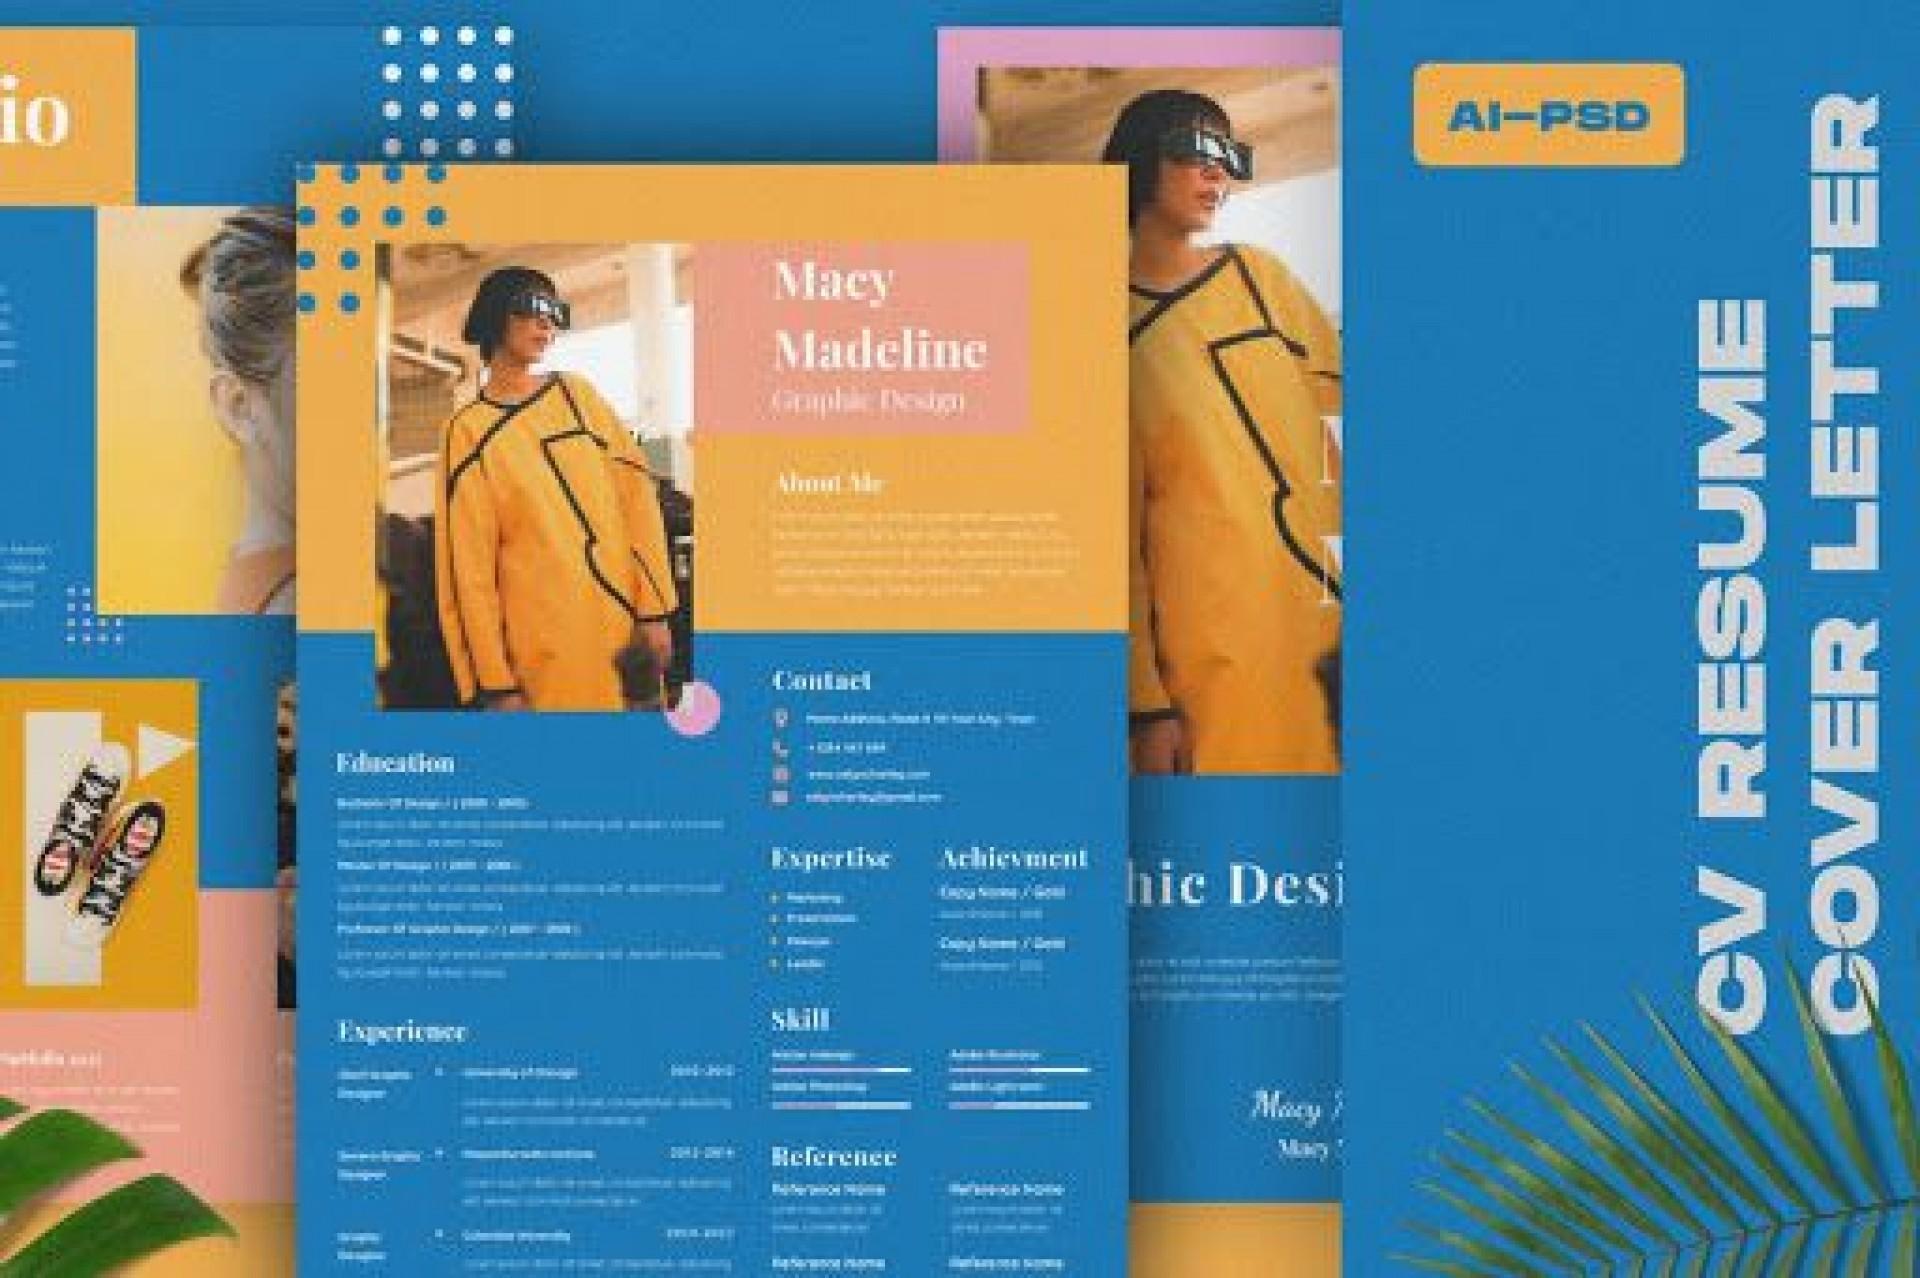 009 Beautiful Adobe Photoshop Resume Template Free Photo  Download1920